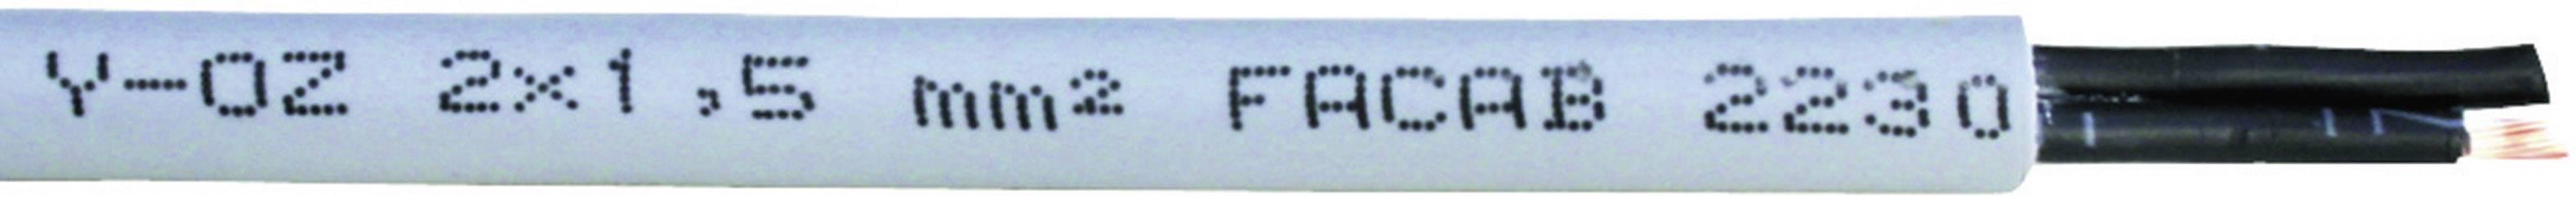 Riadiaci kábel Faber Kabel YSLY-OZ 030630, 5 x 1 mm², vonkajší Ø 8.10 mm, 500 V, metrový tovar, sivá